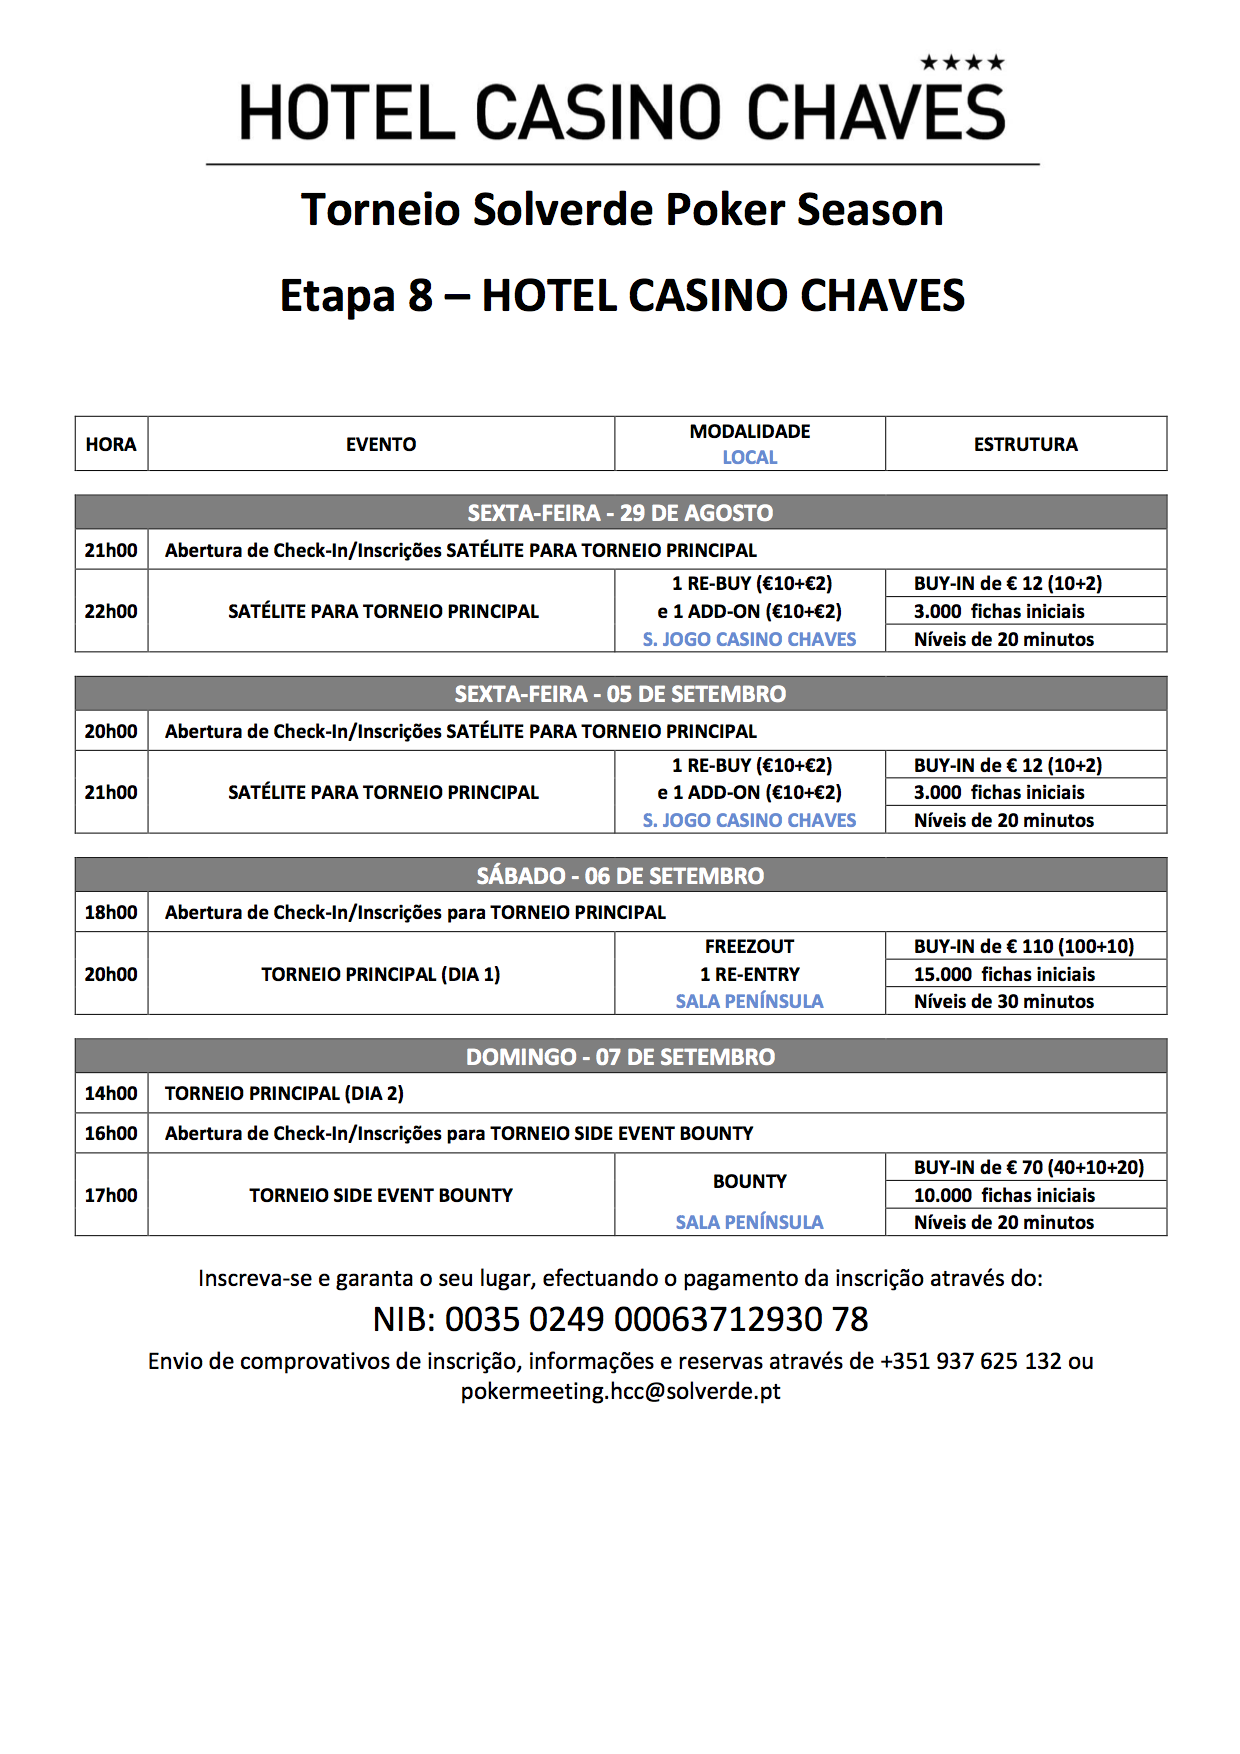 Arranca Amanhã em Chaves a Etapa #8 PokerStars Solverde Poker Season 101